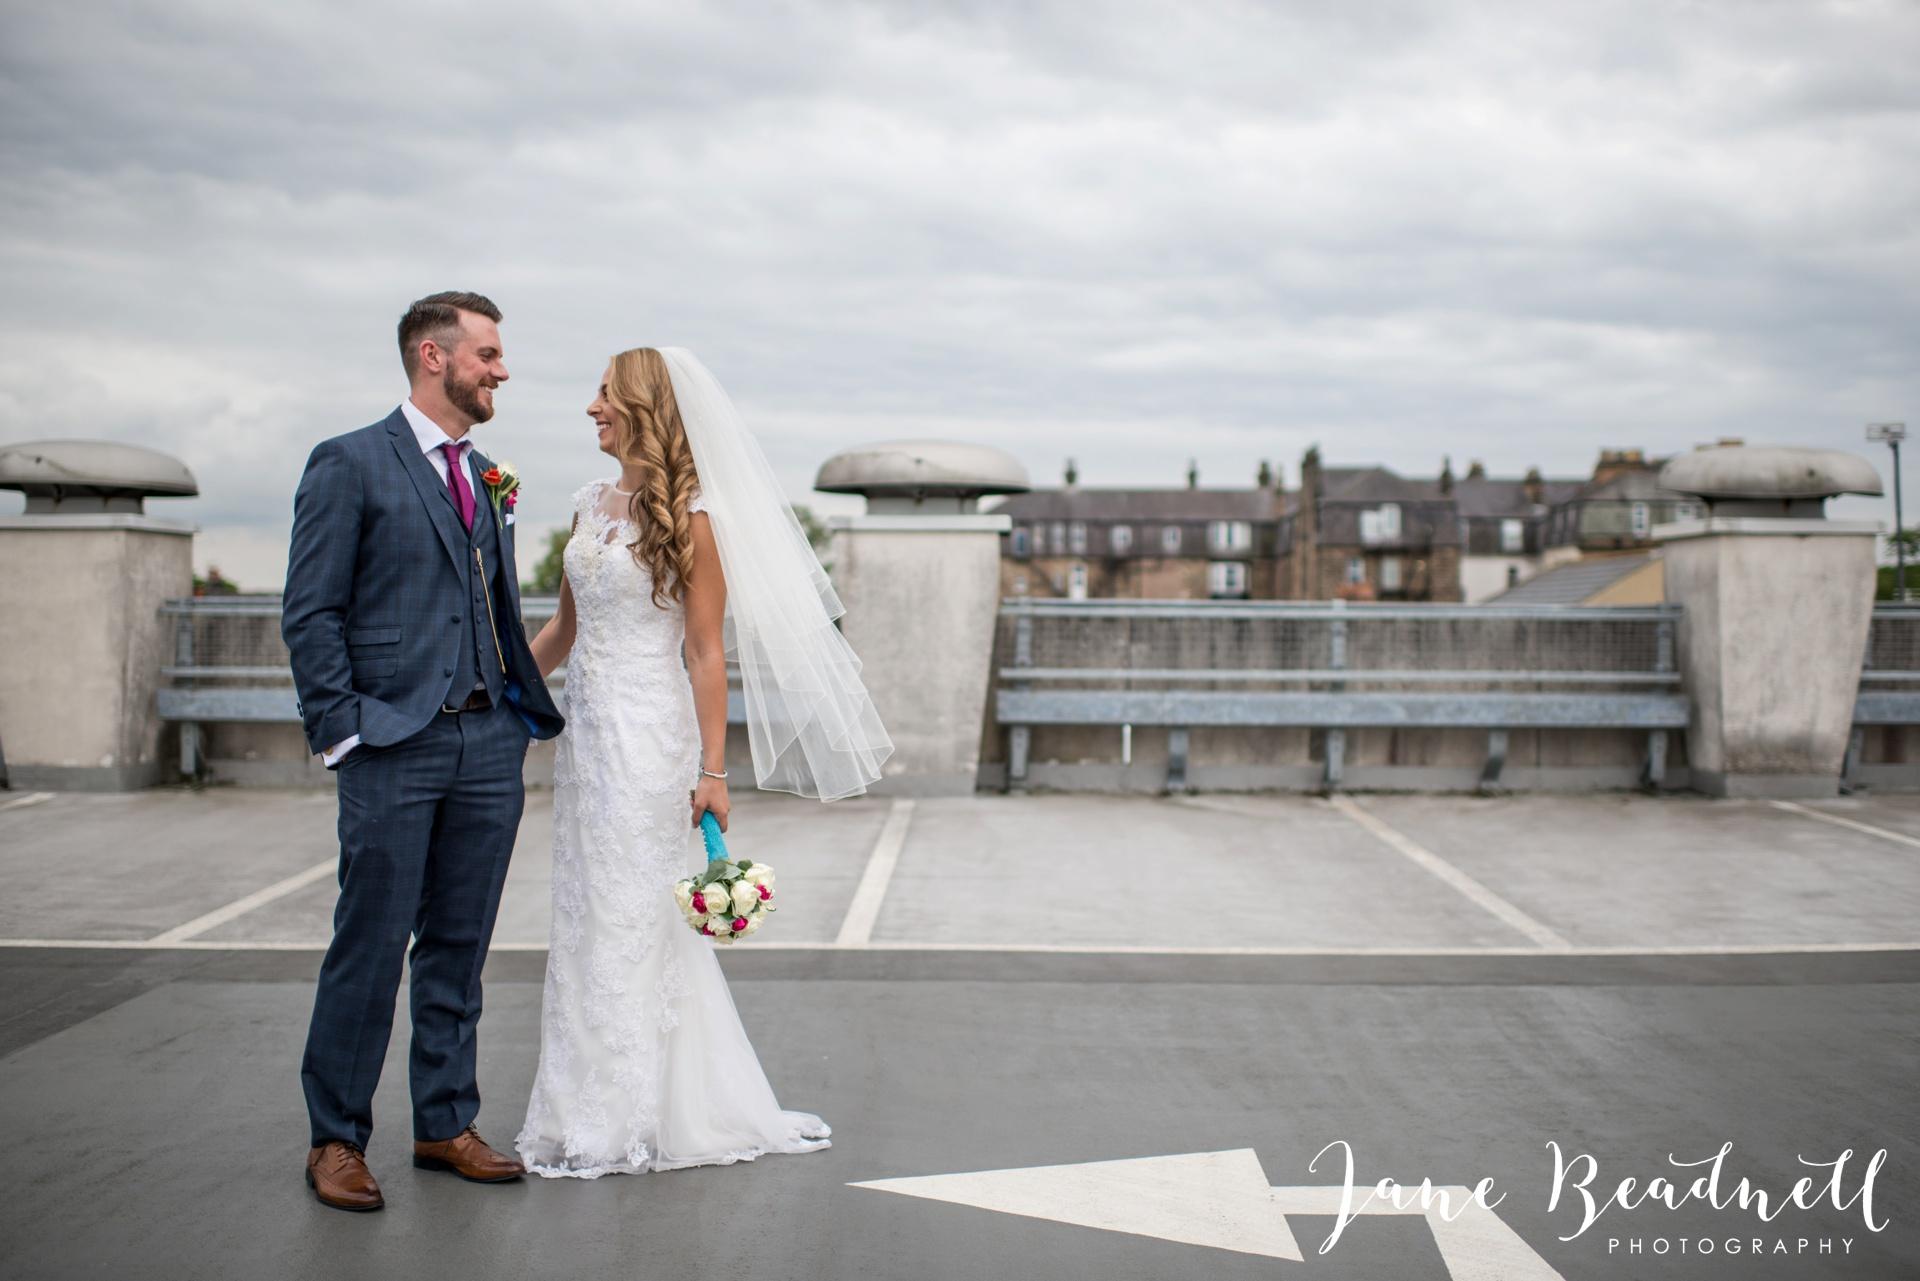 Jane Beadnell fine art wedding photographer Harrogate_0018